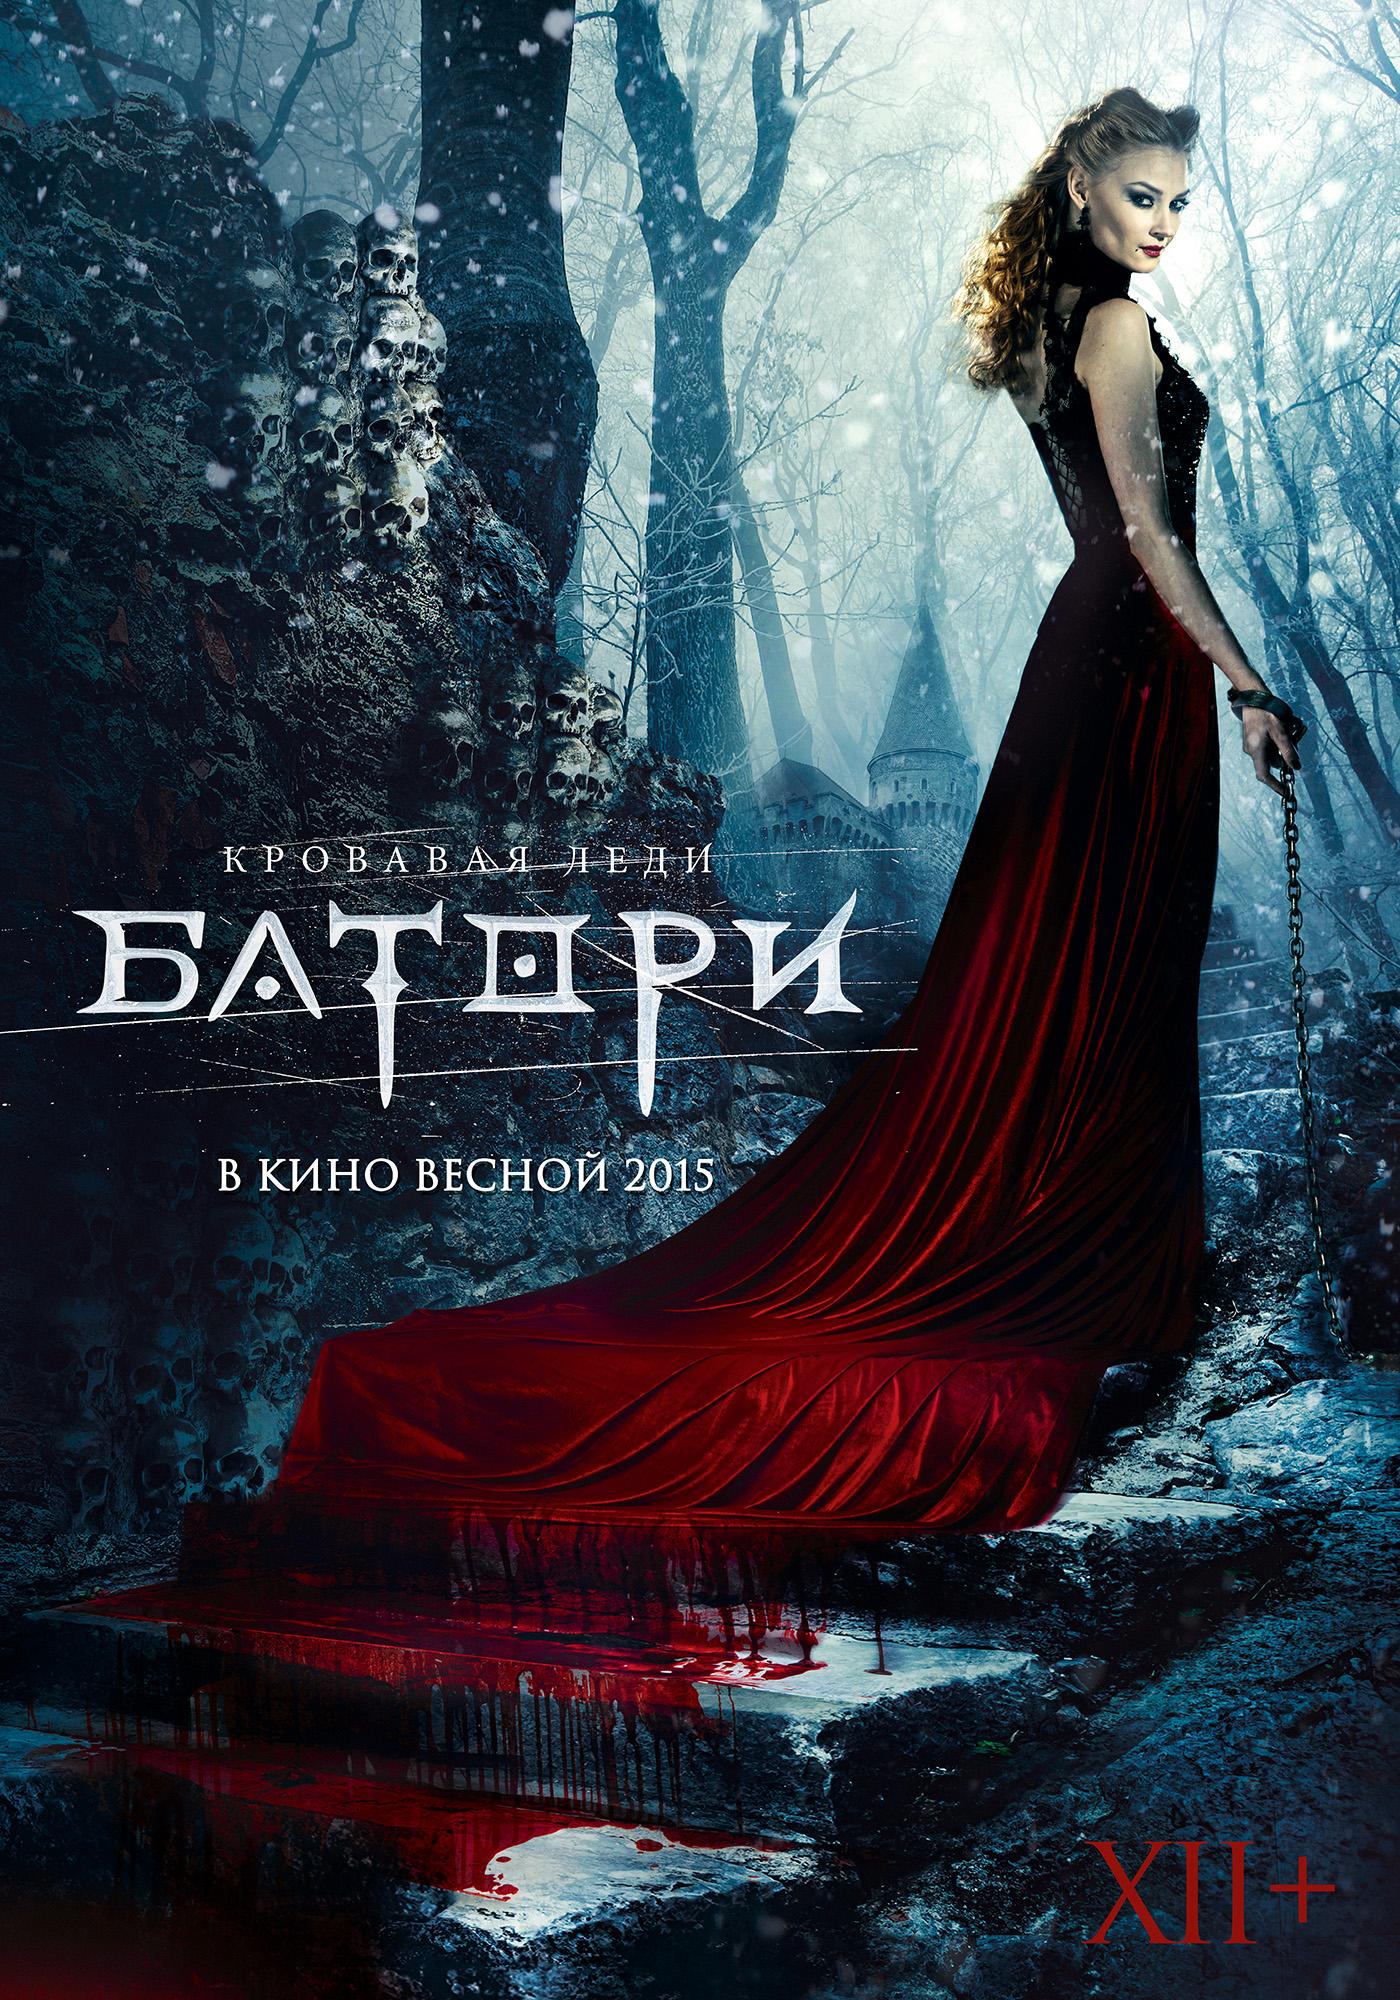 плакат фильма постер Кровавая леди Батори